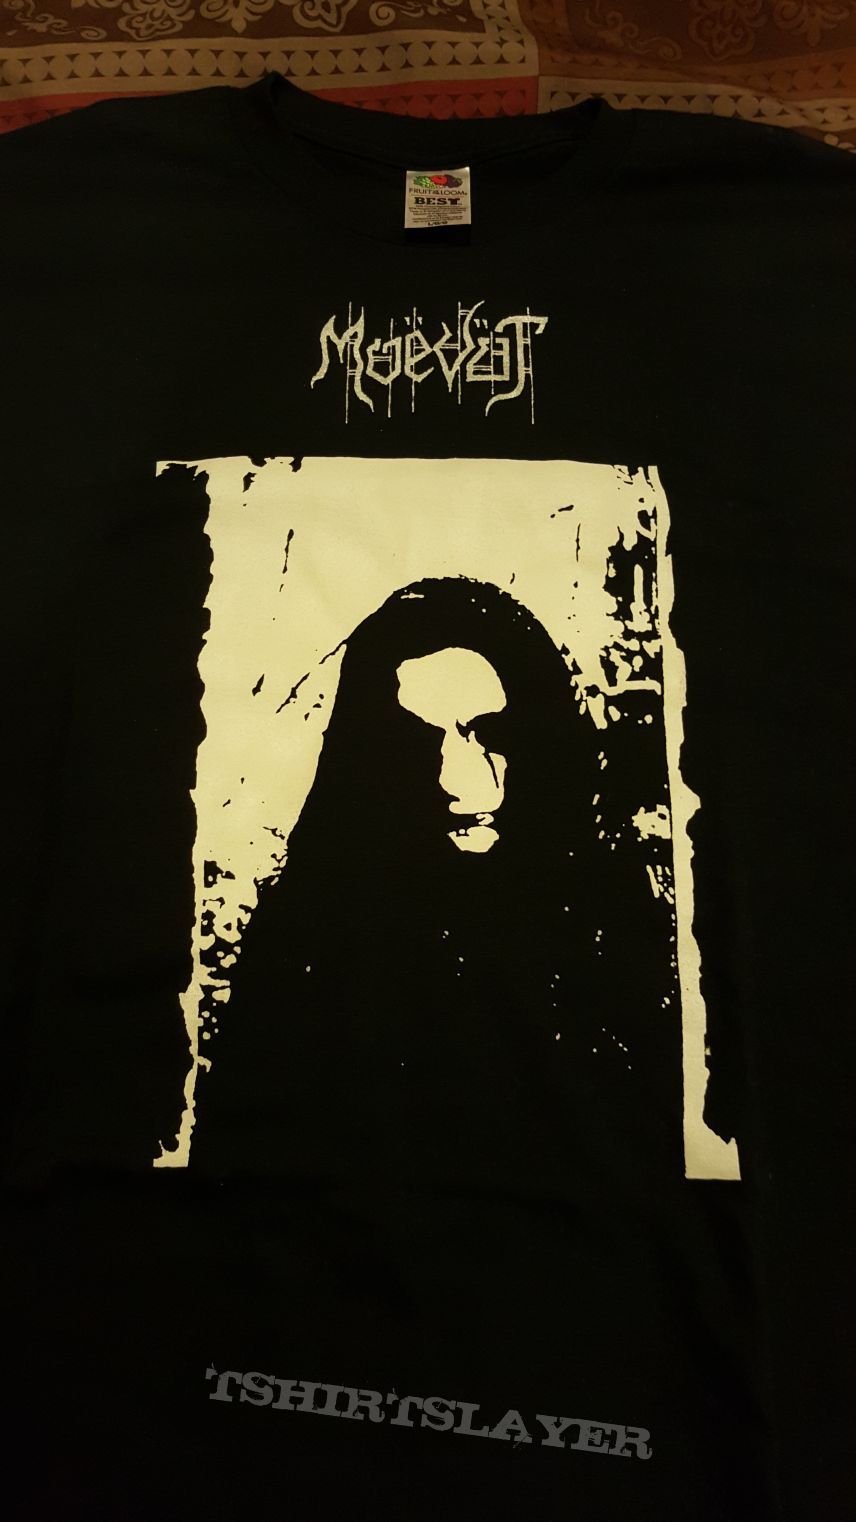 Moëvöt - Vordb Dréagvor Uèzréèvb